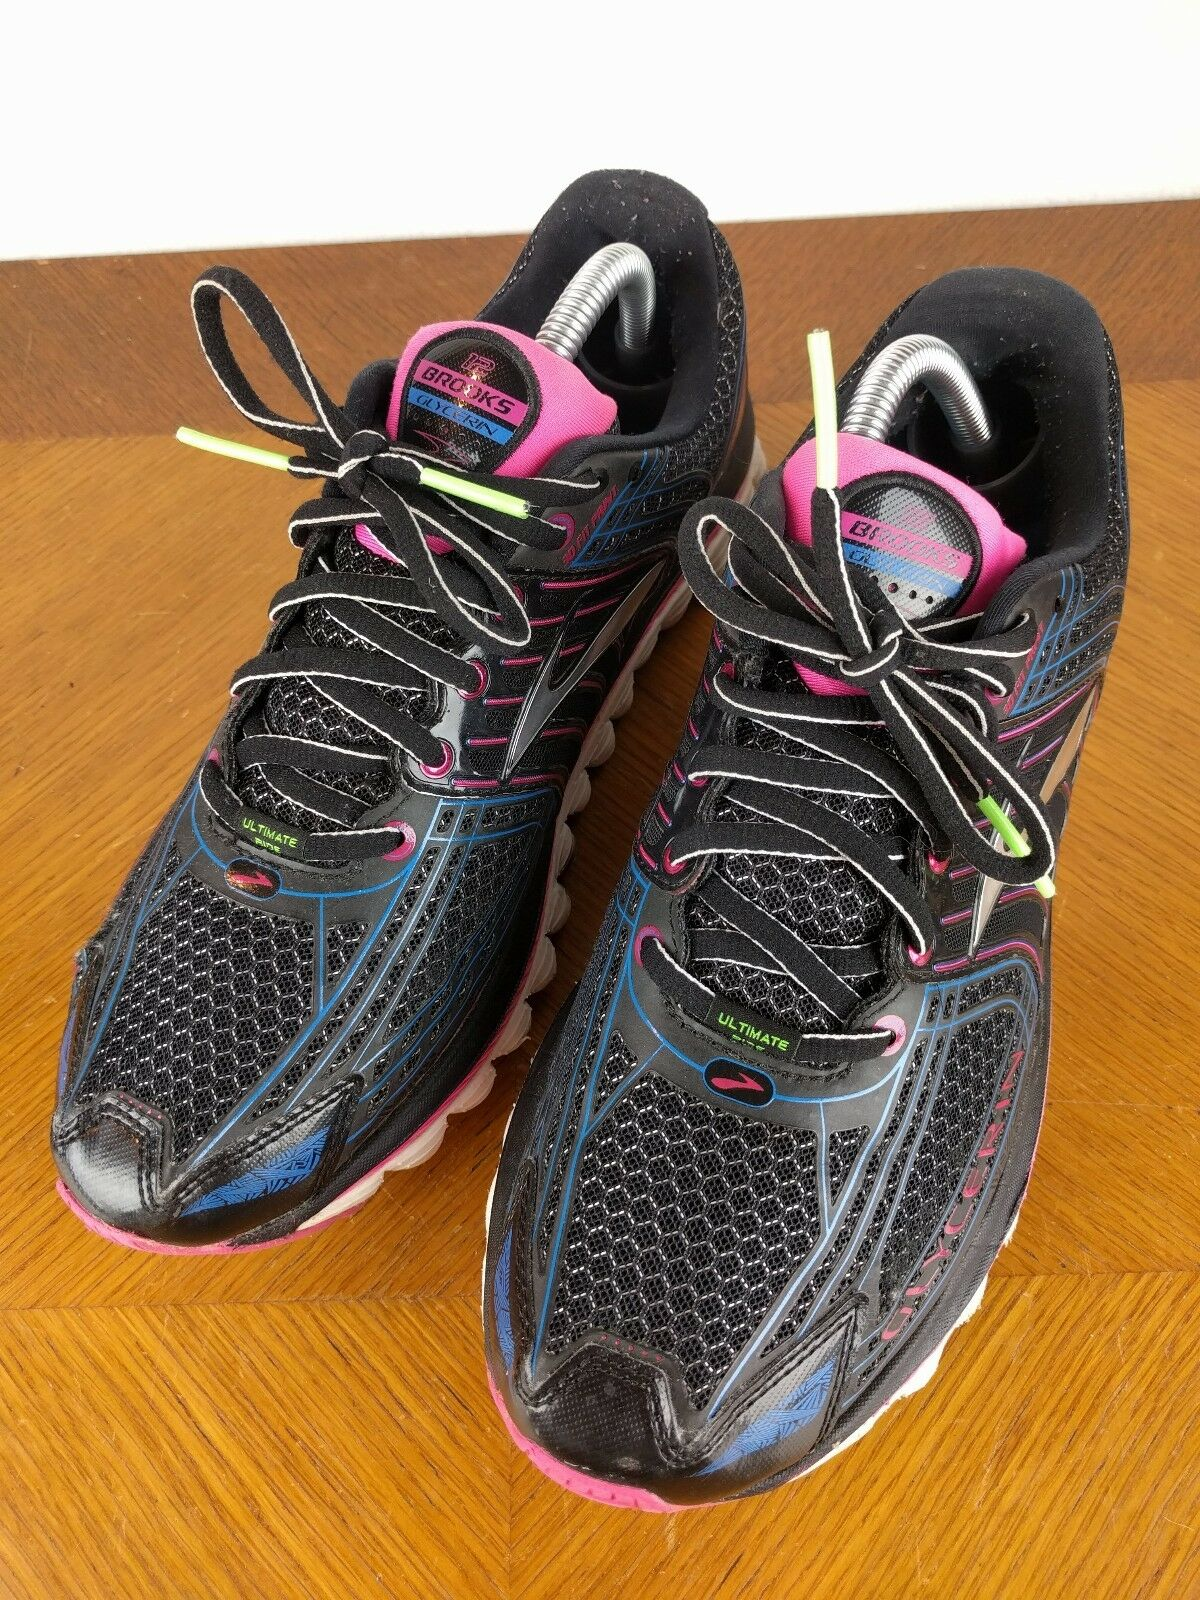 noir rose Glycerin Brooks Running Chaussures hommes